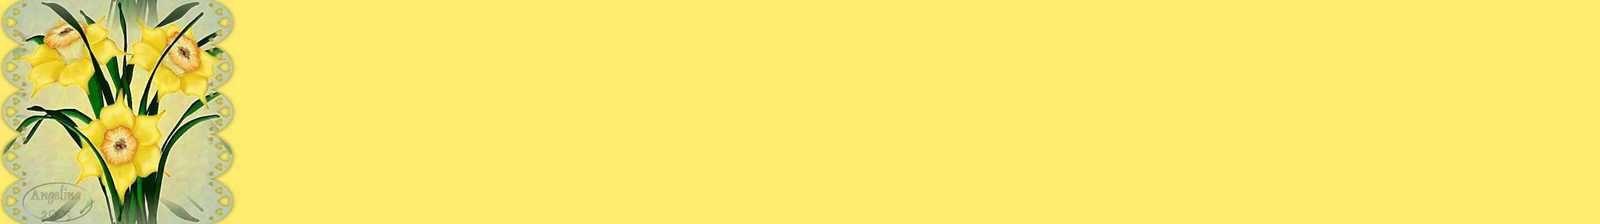 Fleurs jaune (Jonquilles) Incredimail &amp&#x3B; Papier A4 h l &amp&#x3B; outlook &amp&#x3B; enveloppe &amp&#x3B; 2 cartes A5 &amp&#x3B; signets 3 langues   2daffodils